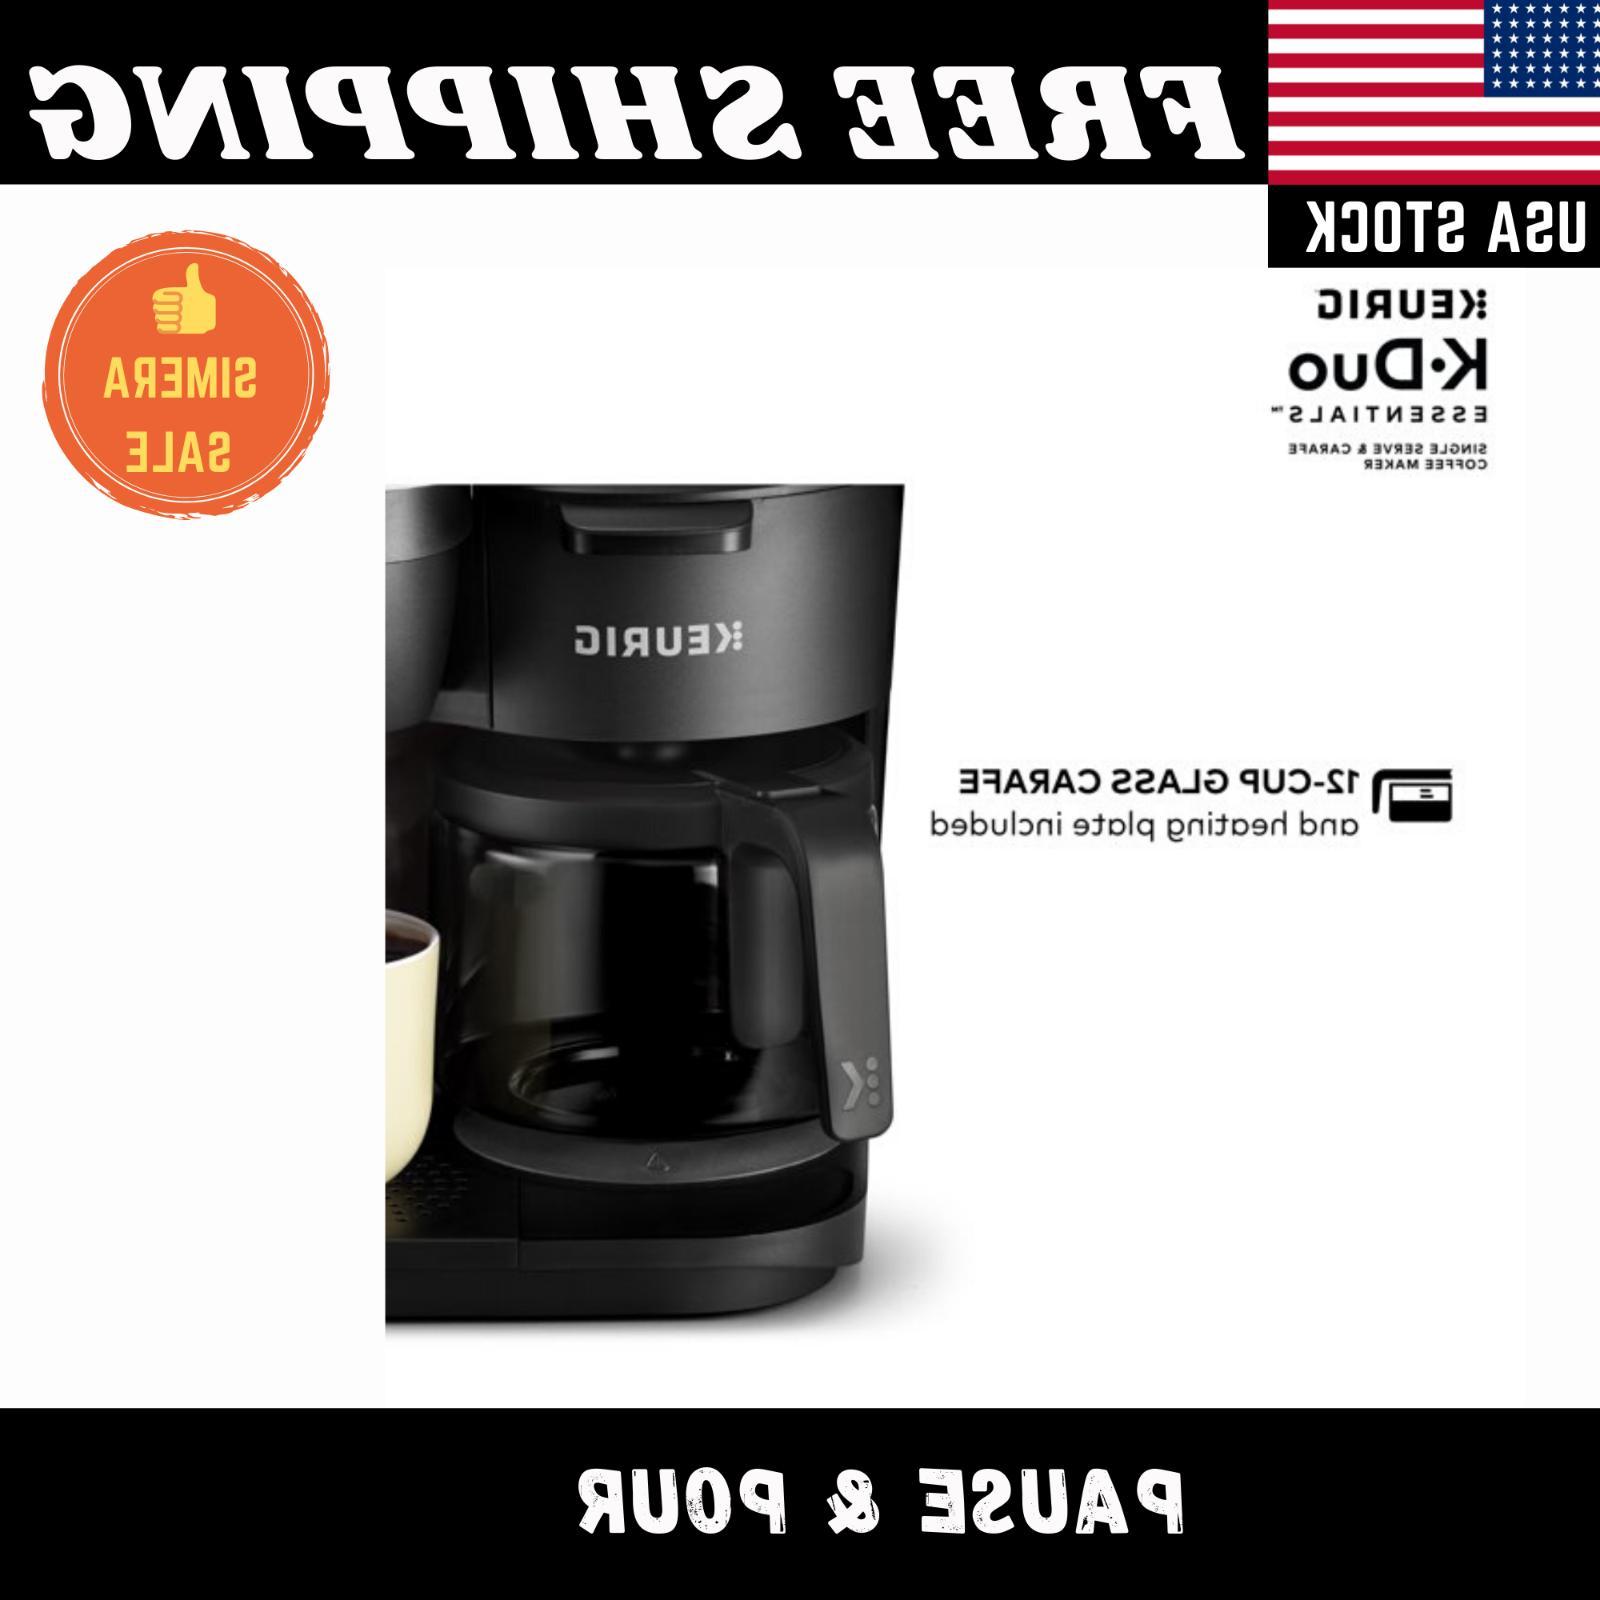 COFFEE 12 Pod Keurig Portable